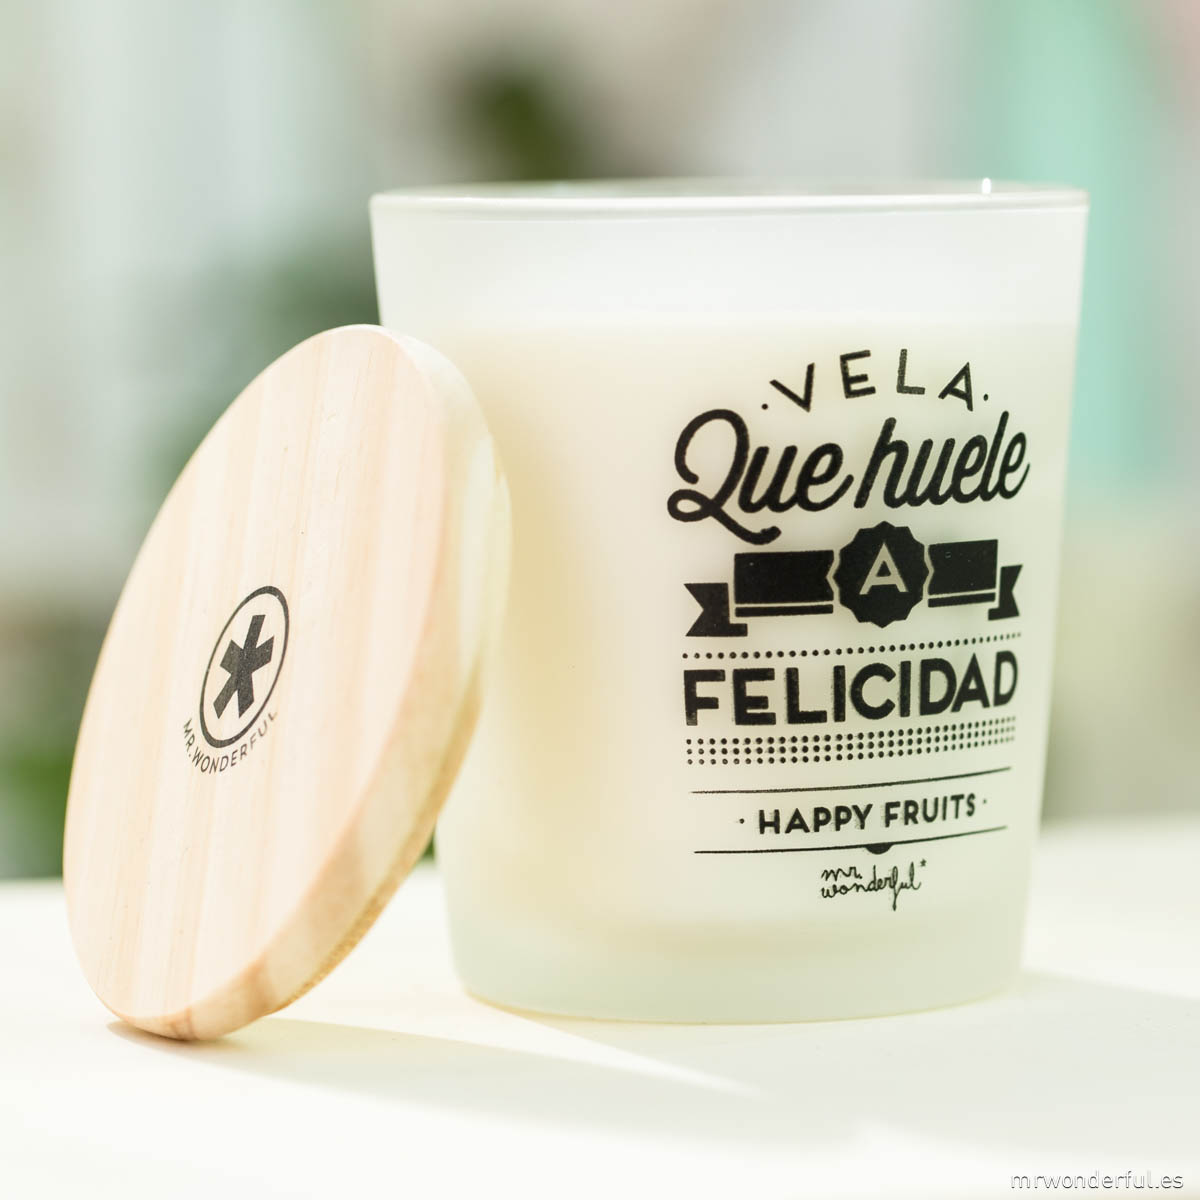 mrwonderful_VELA-04_vela-que-huele-a-felicidad-HAPPY-FRUITS-13